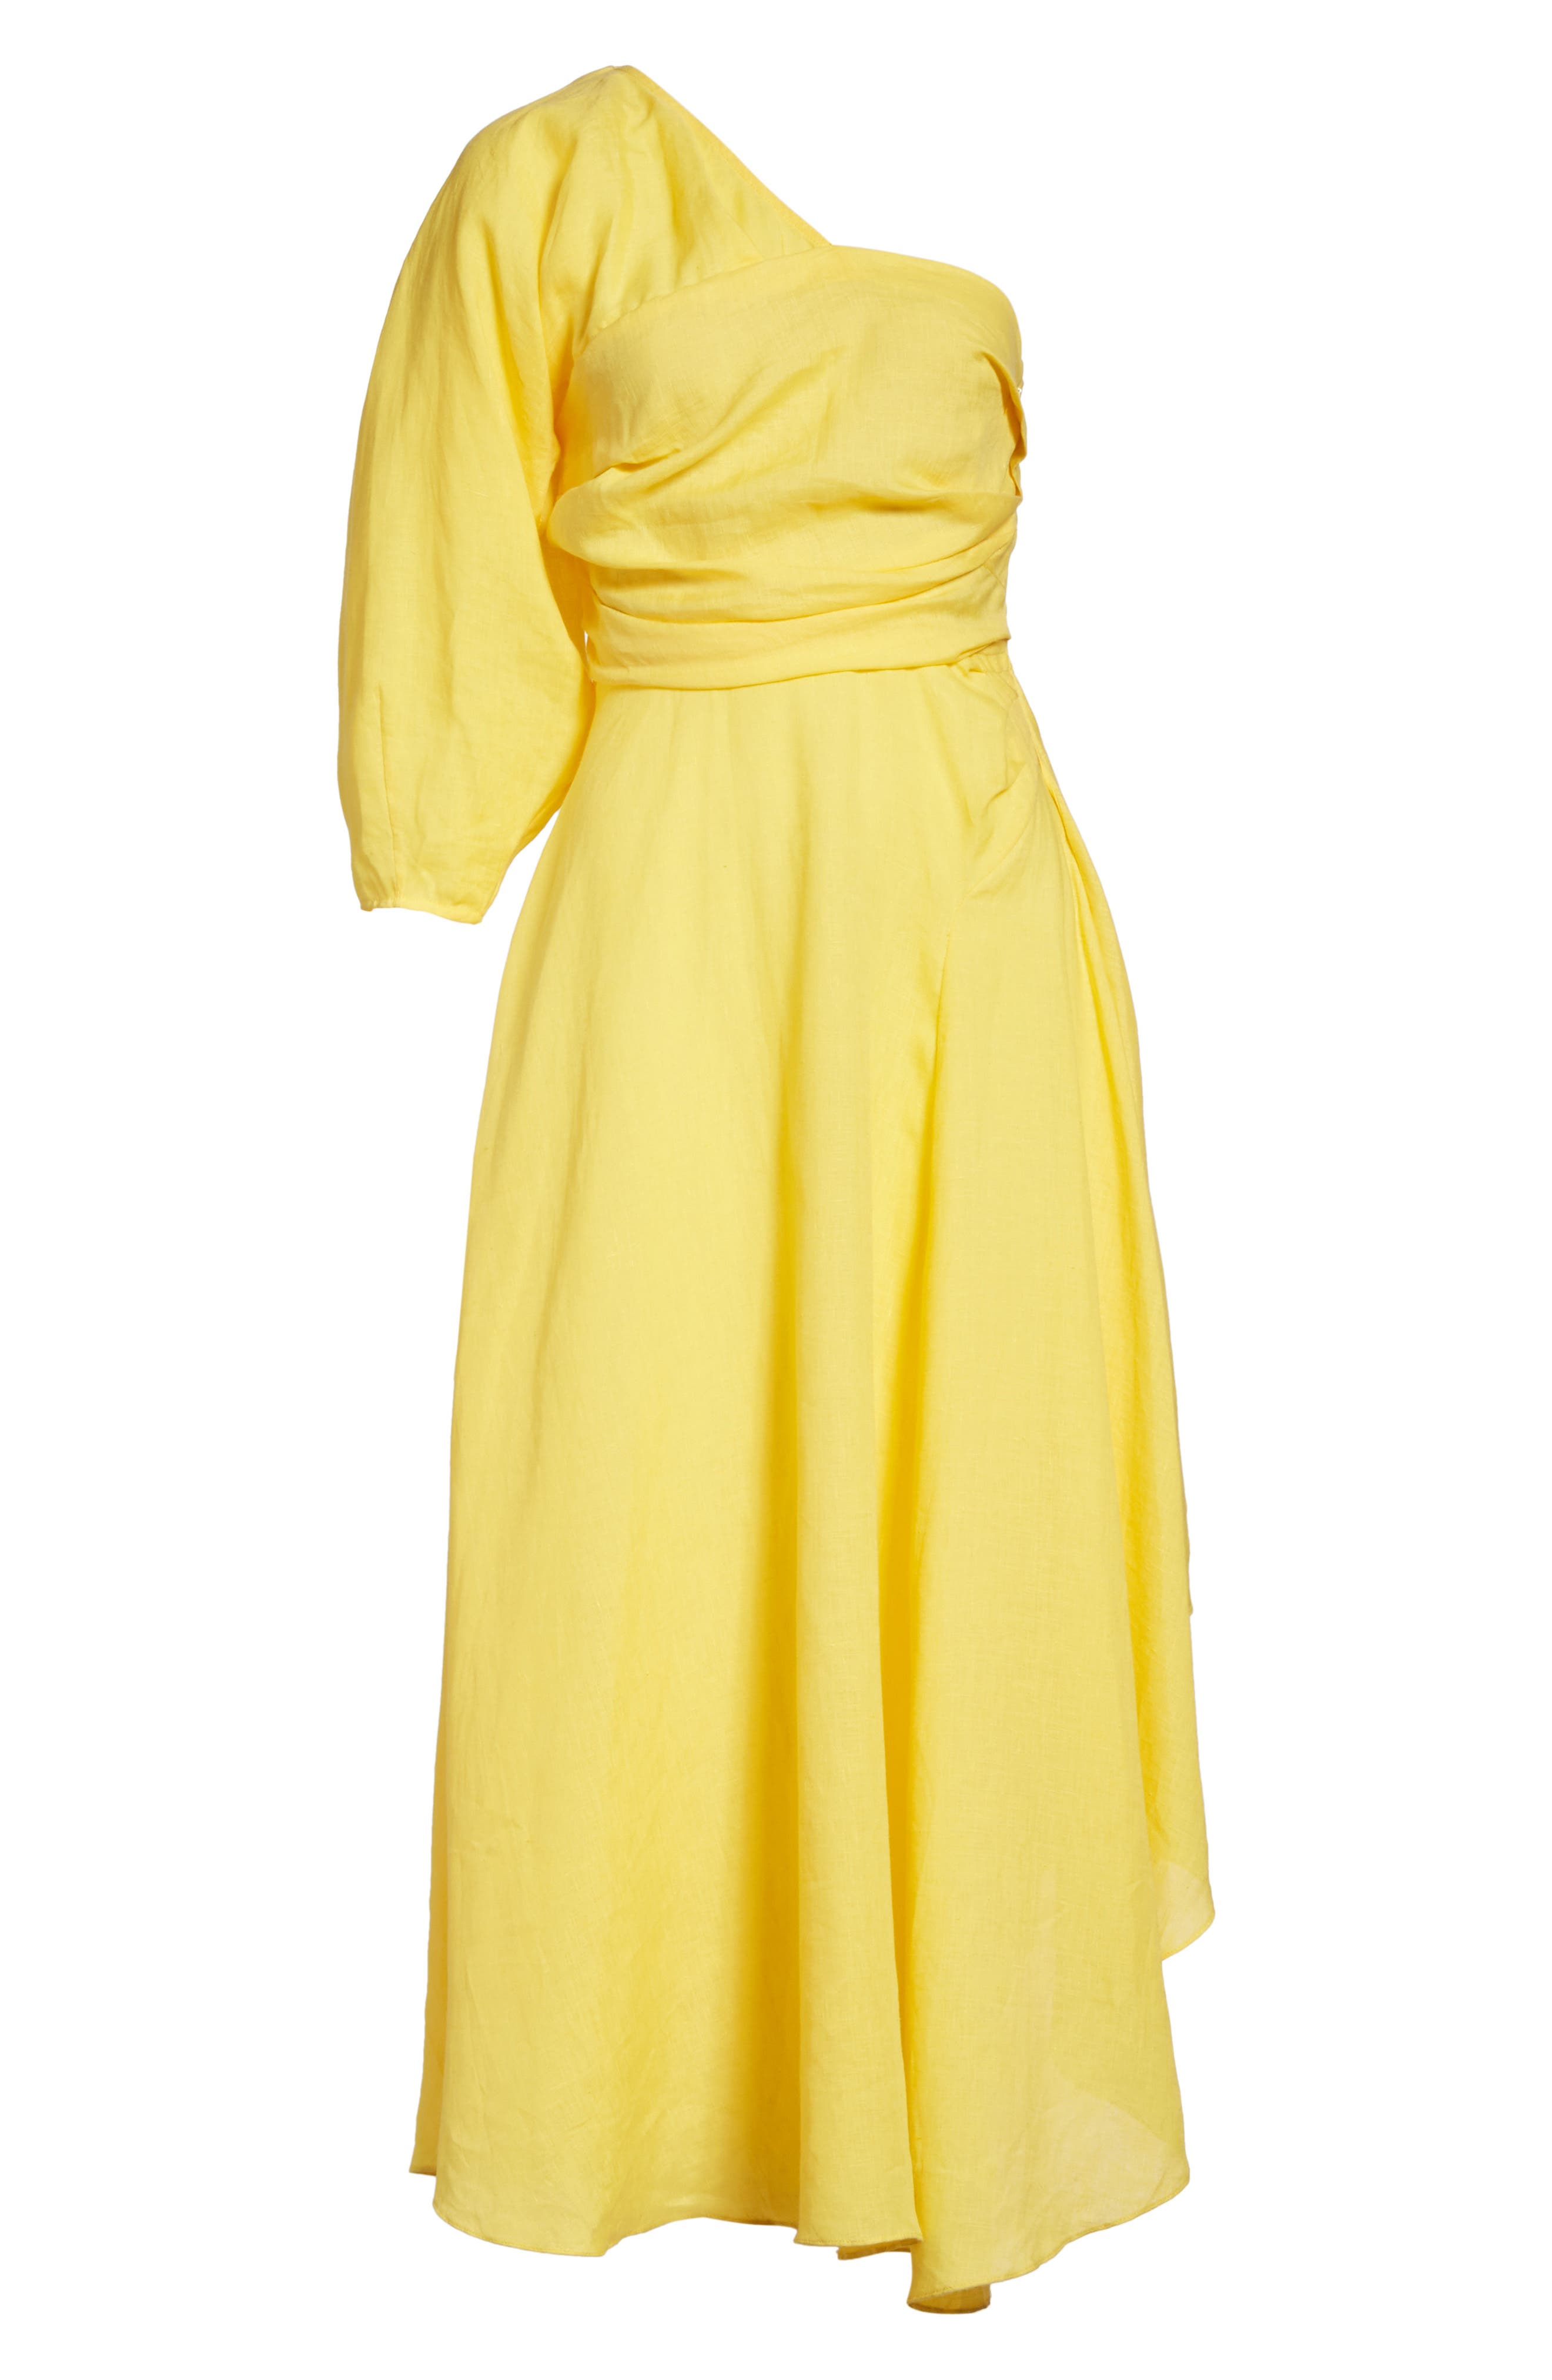 Tipple One-Shoulder Dress,                             Alternate thumbnail 6, color,                             770